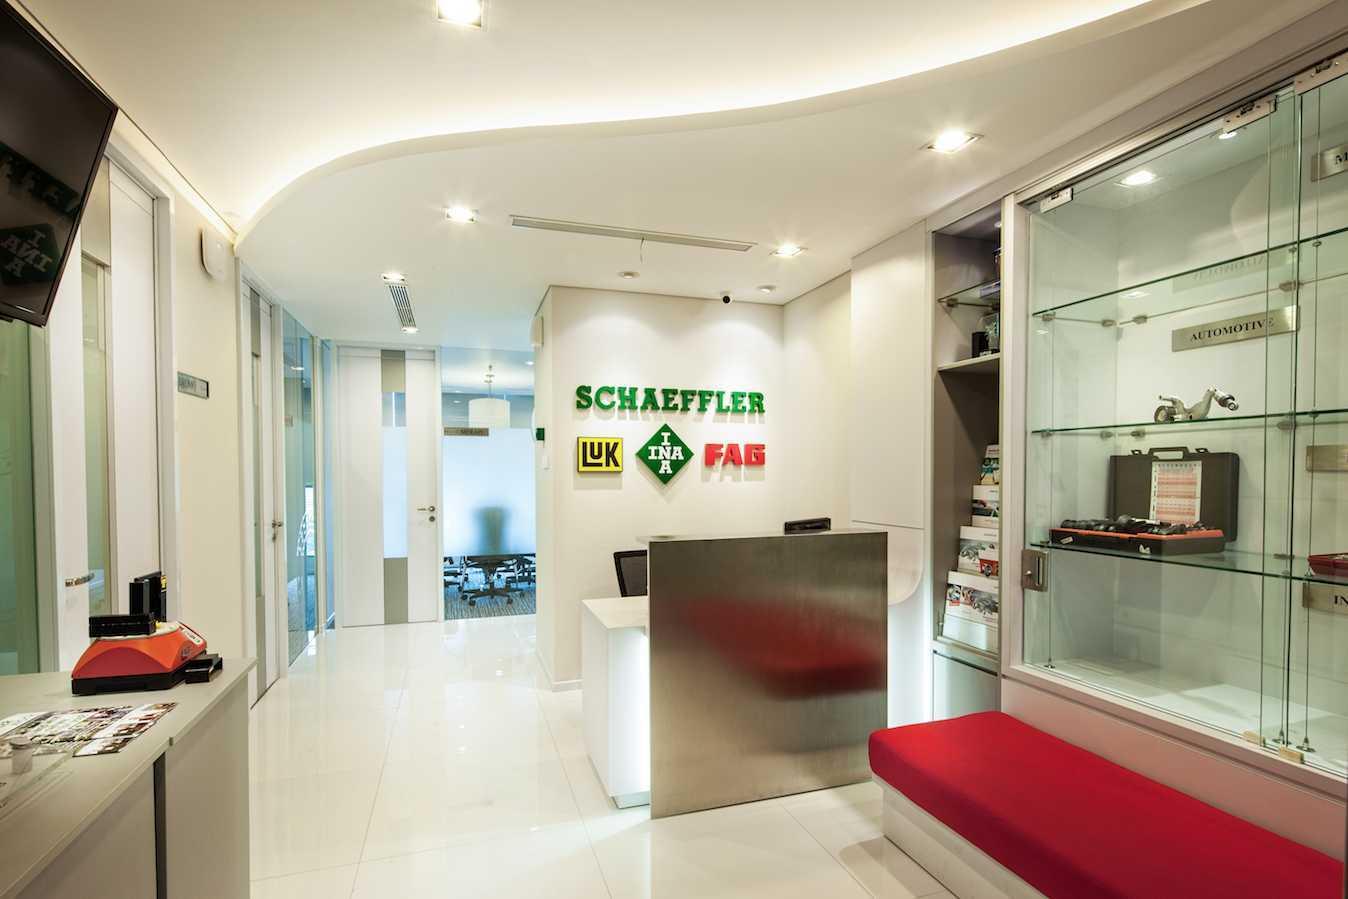 Pt Asa Adiguna Schaeffler Bearings Indonesia Lippo Kuningan Building Lippo Kuningan Building Reception Area Skandinavia 24543